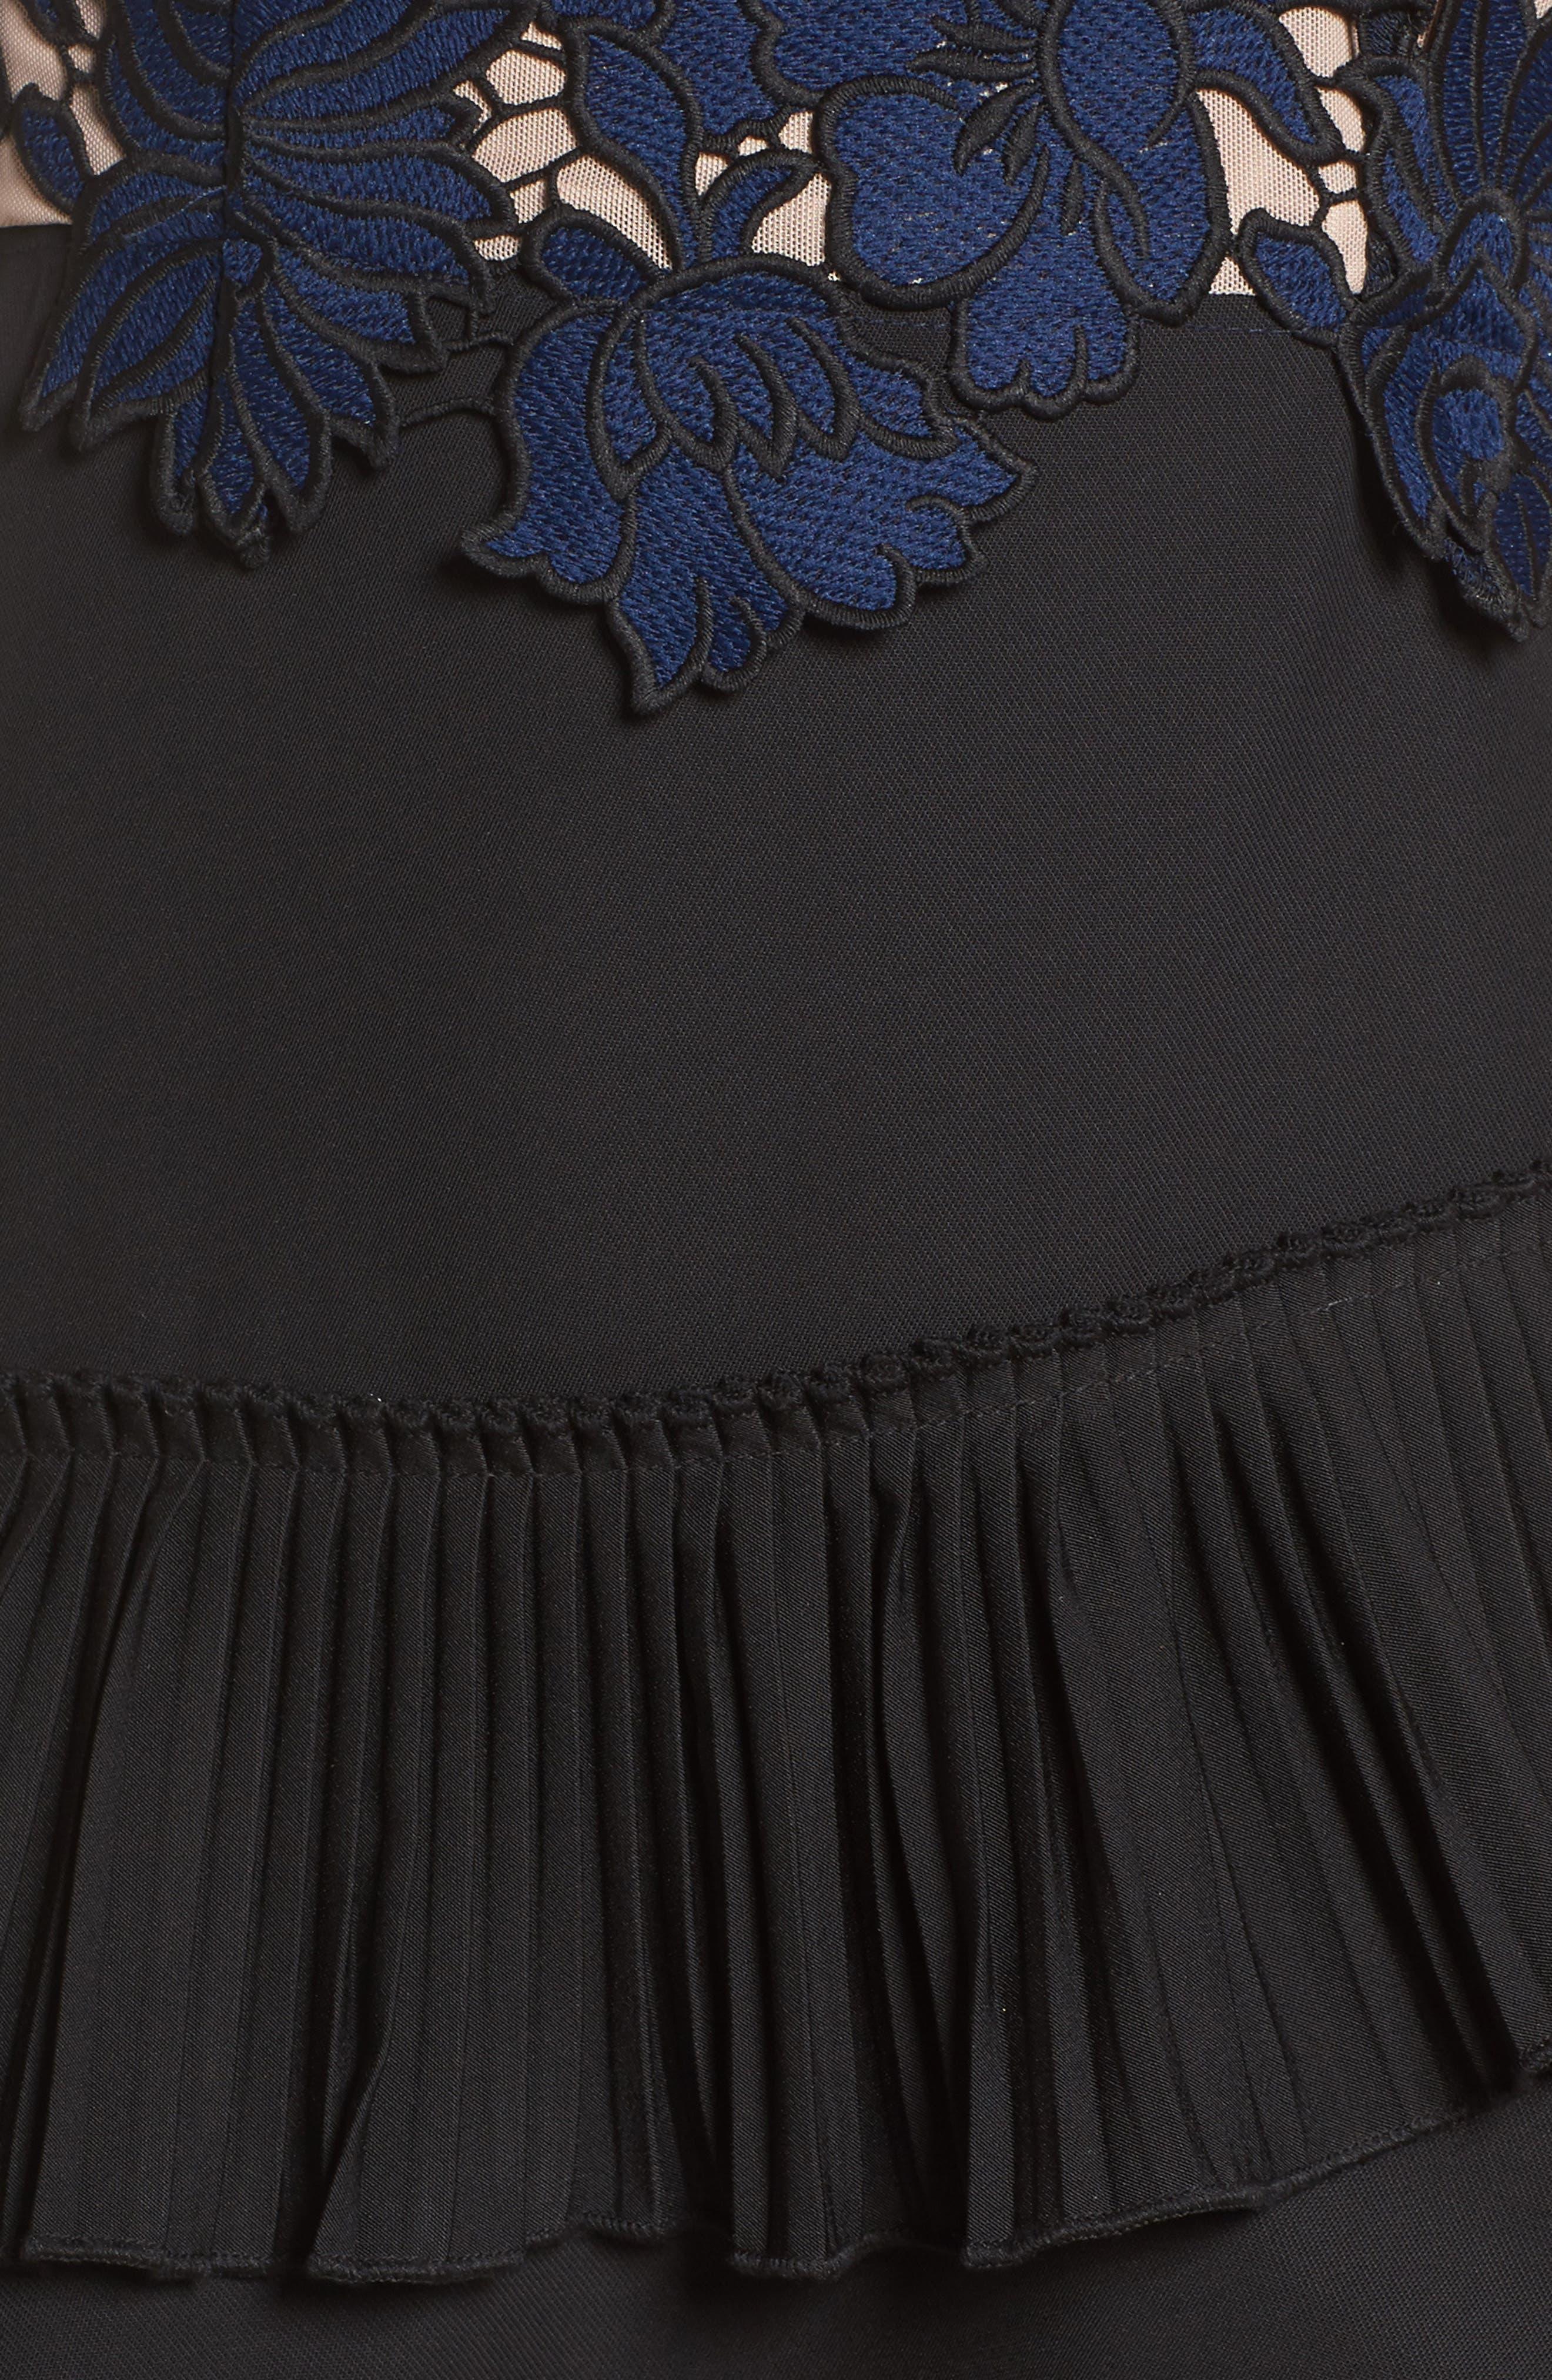 Alexa Lace & Ruffle Tier Dress,                             Alternate thumbnail 6, color,                             Black/ Navy